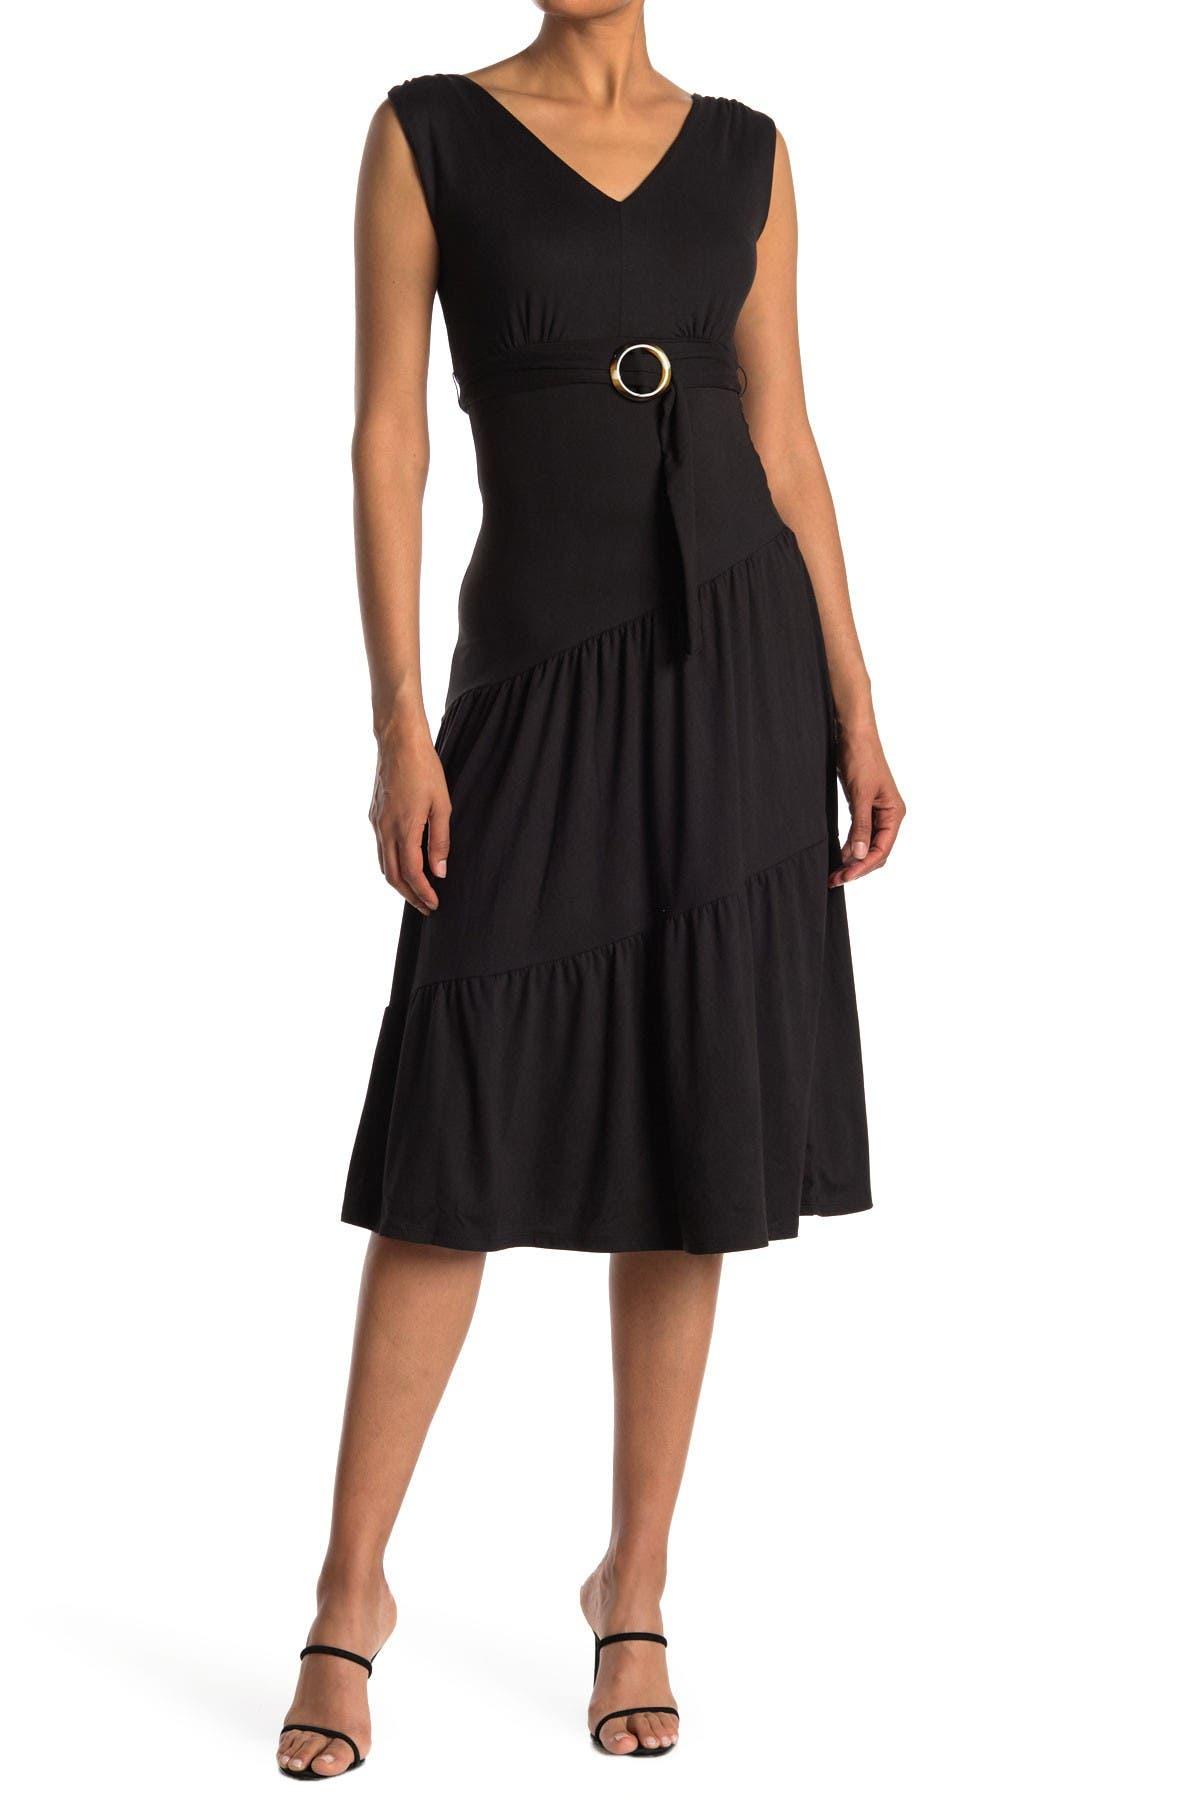 Image of Velvet Torch Belted Tiered Hem Midi Dress